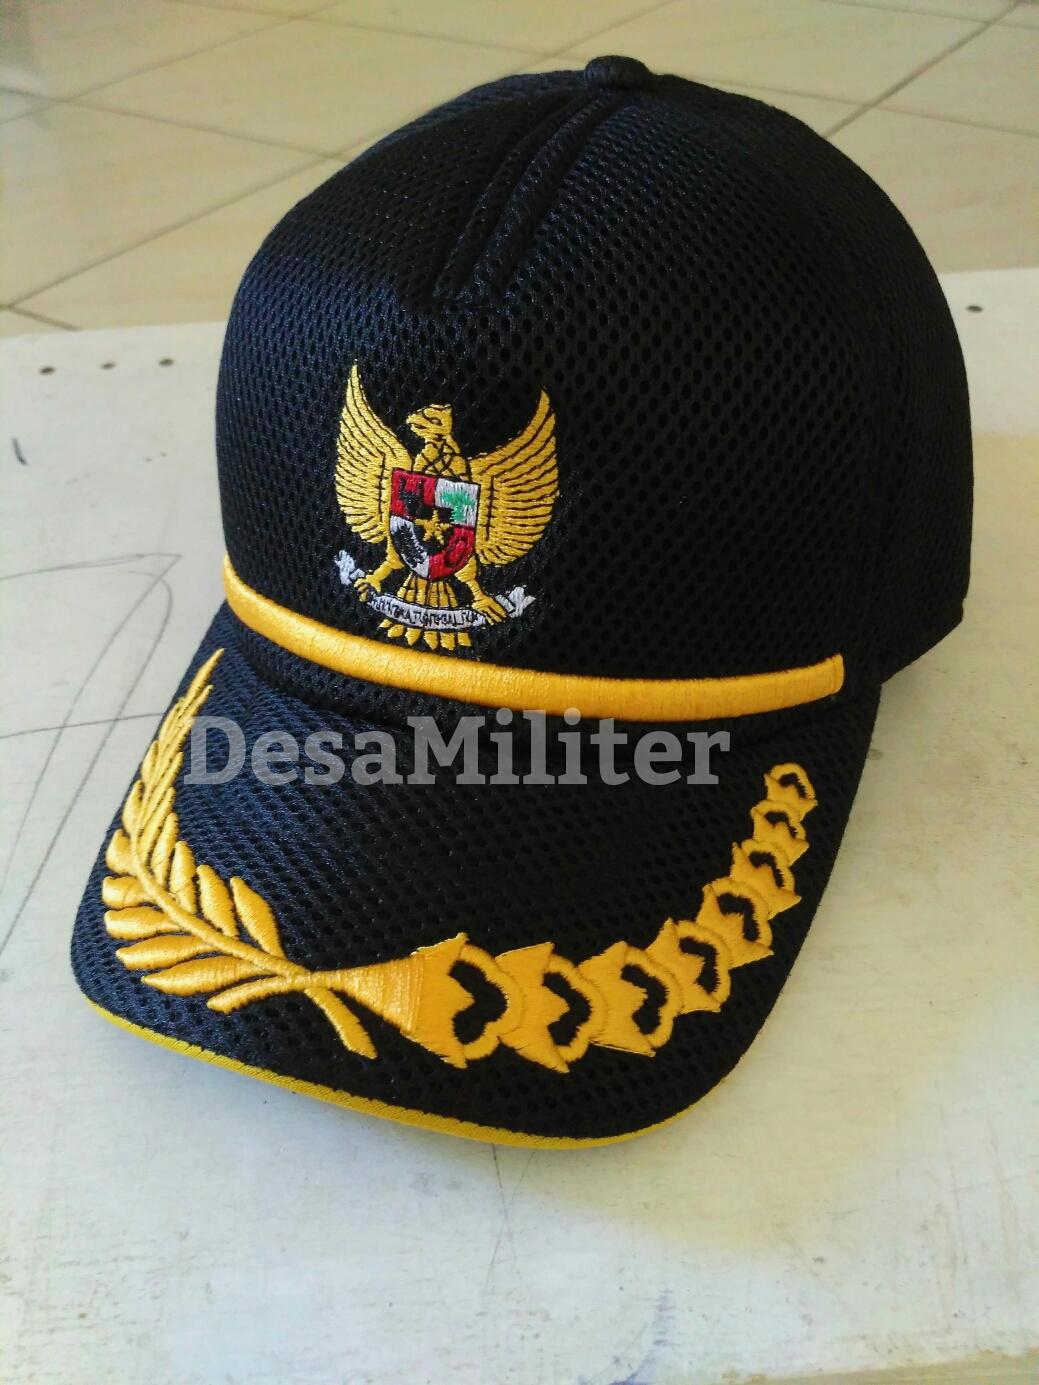 Topi Jaring - Topi Lapangan - Pilkada - Topi Garuda - Kepala Desa - Walikota - Bupati - Padi Kapas